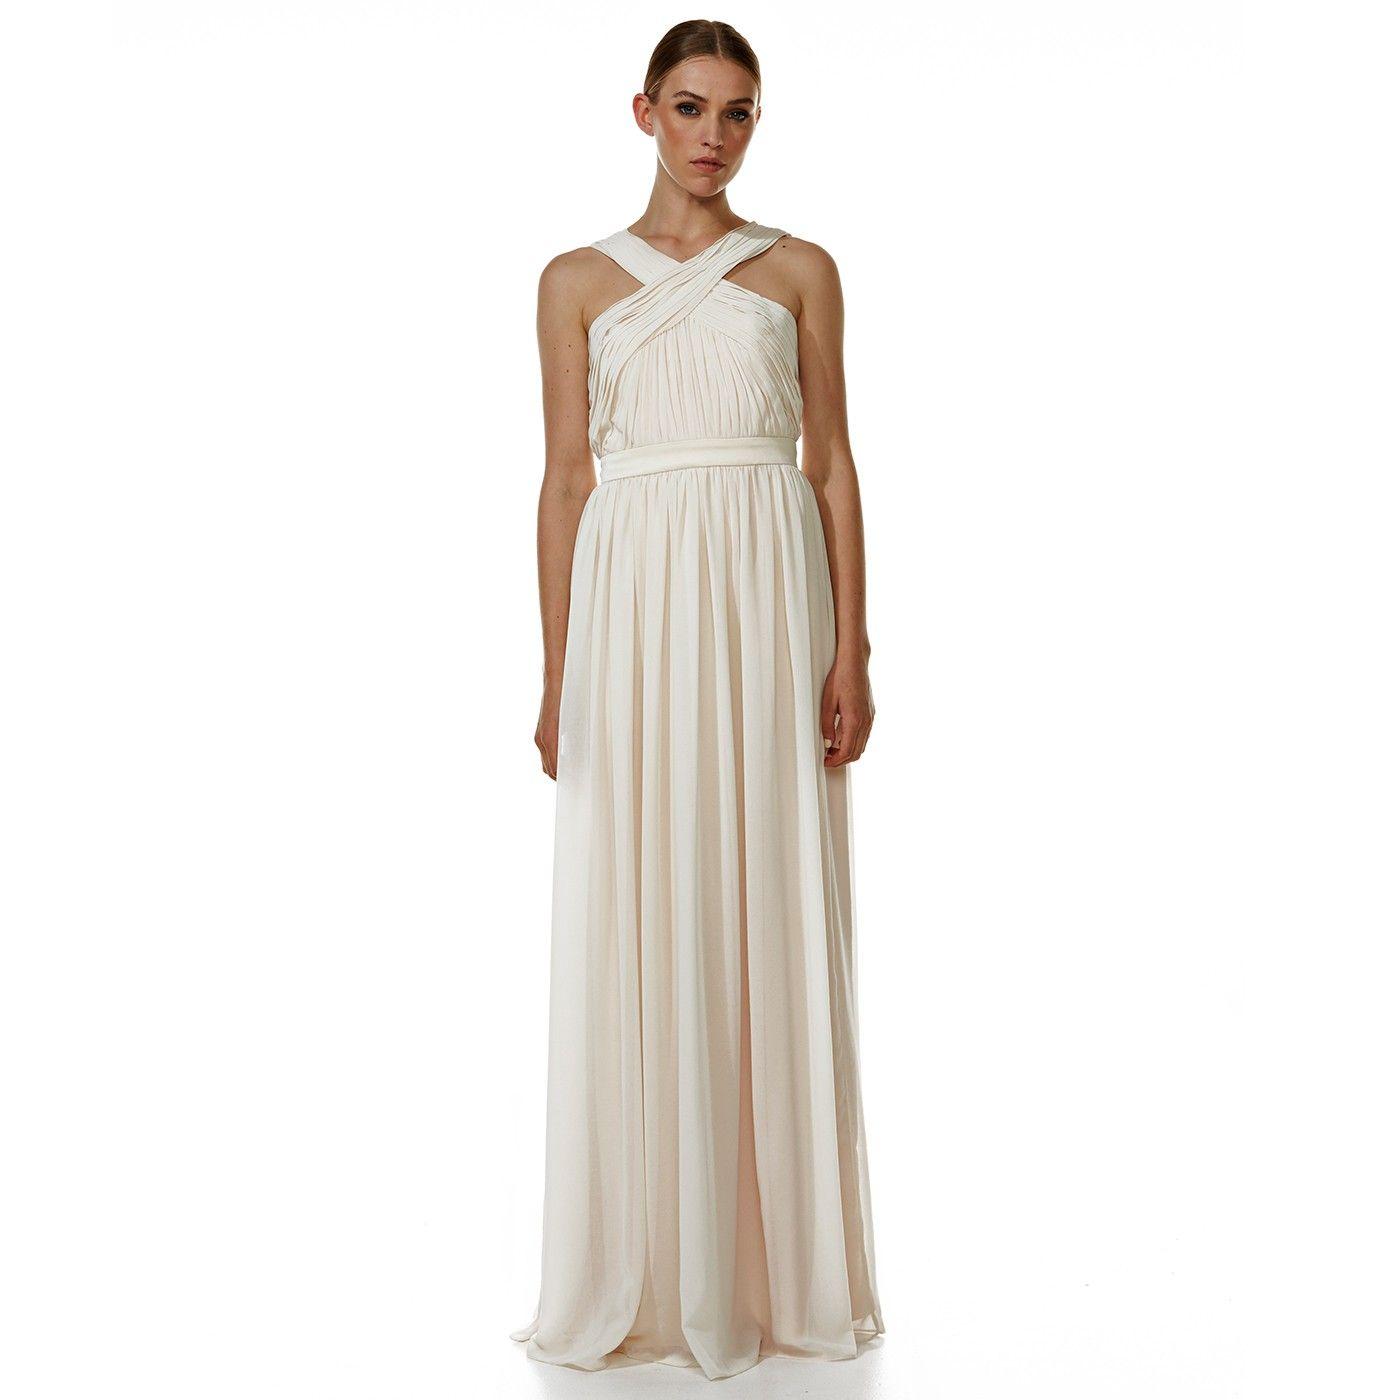 Langham gemma bridesmaid dress wedding in the woods langham gemma bridesmaid dress ombrellifo Gallery